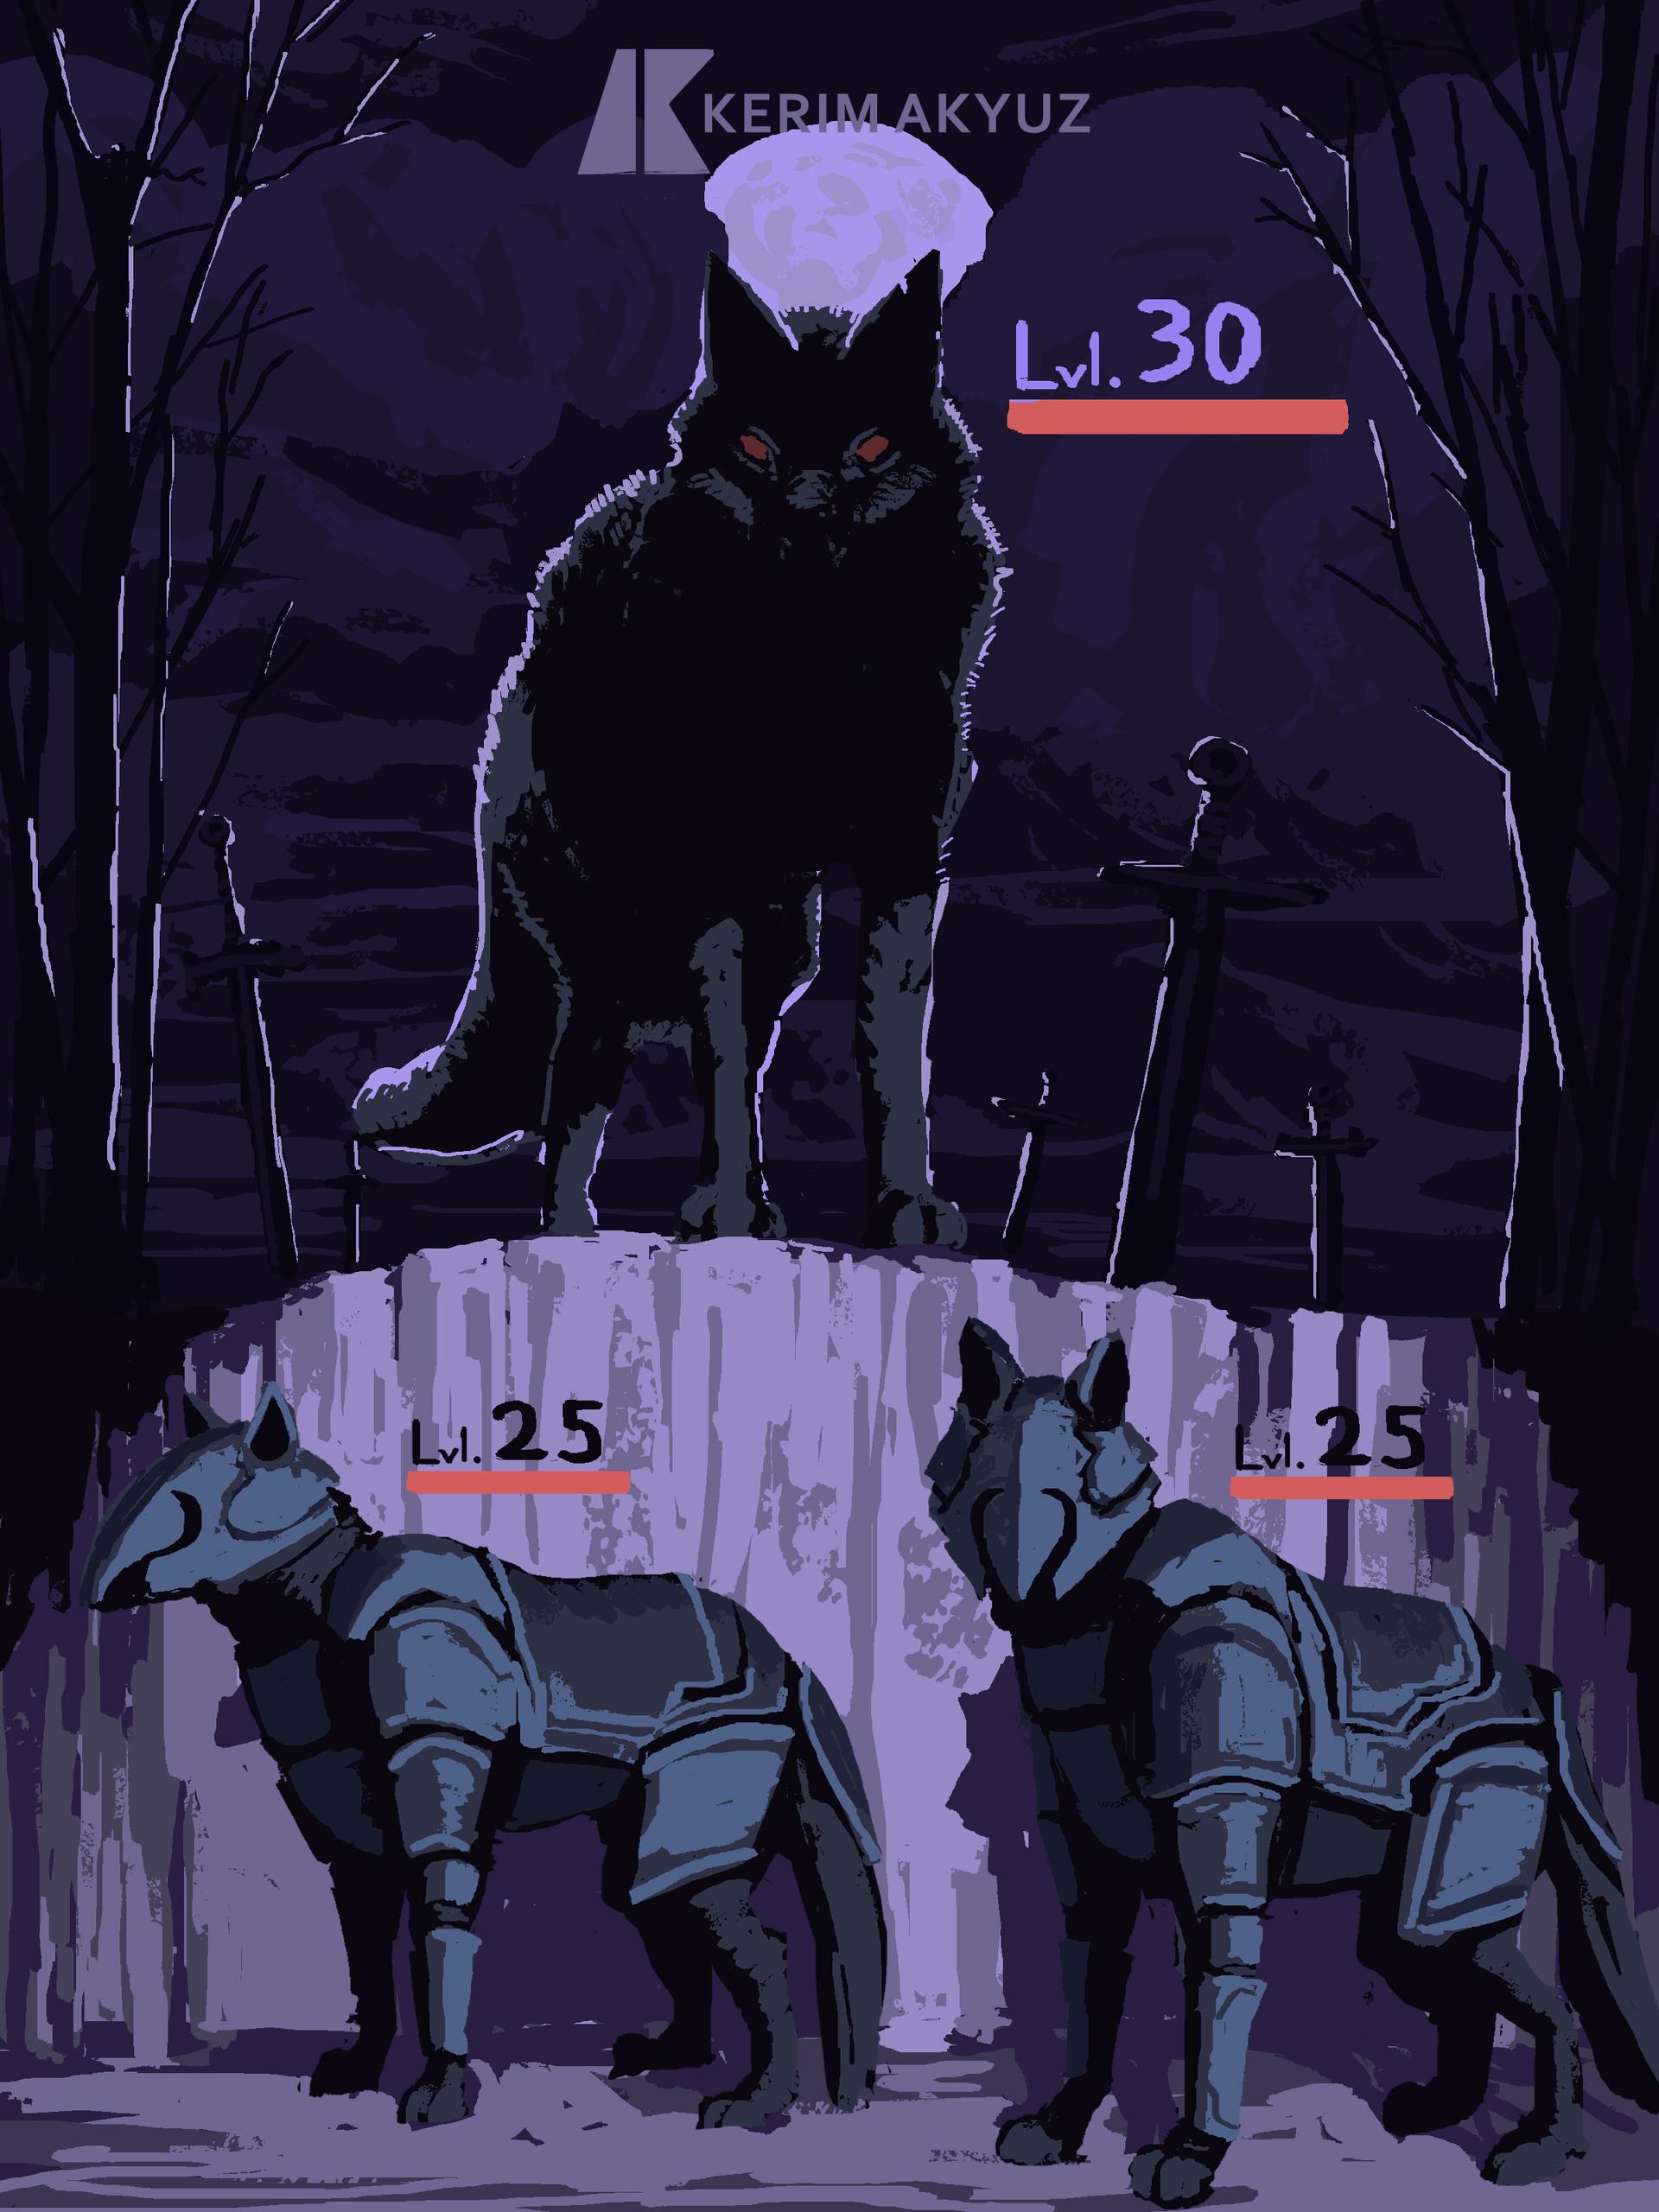 Kerim akyuz 221 lunarknights